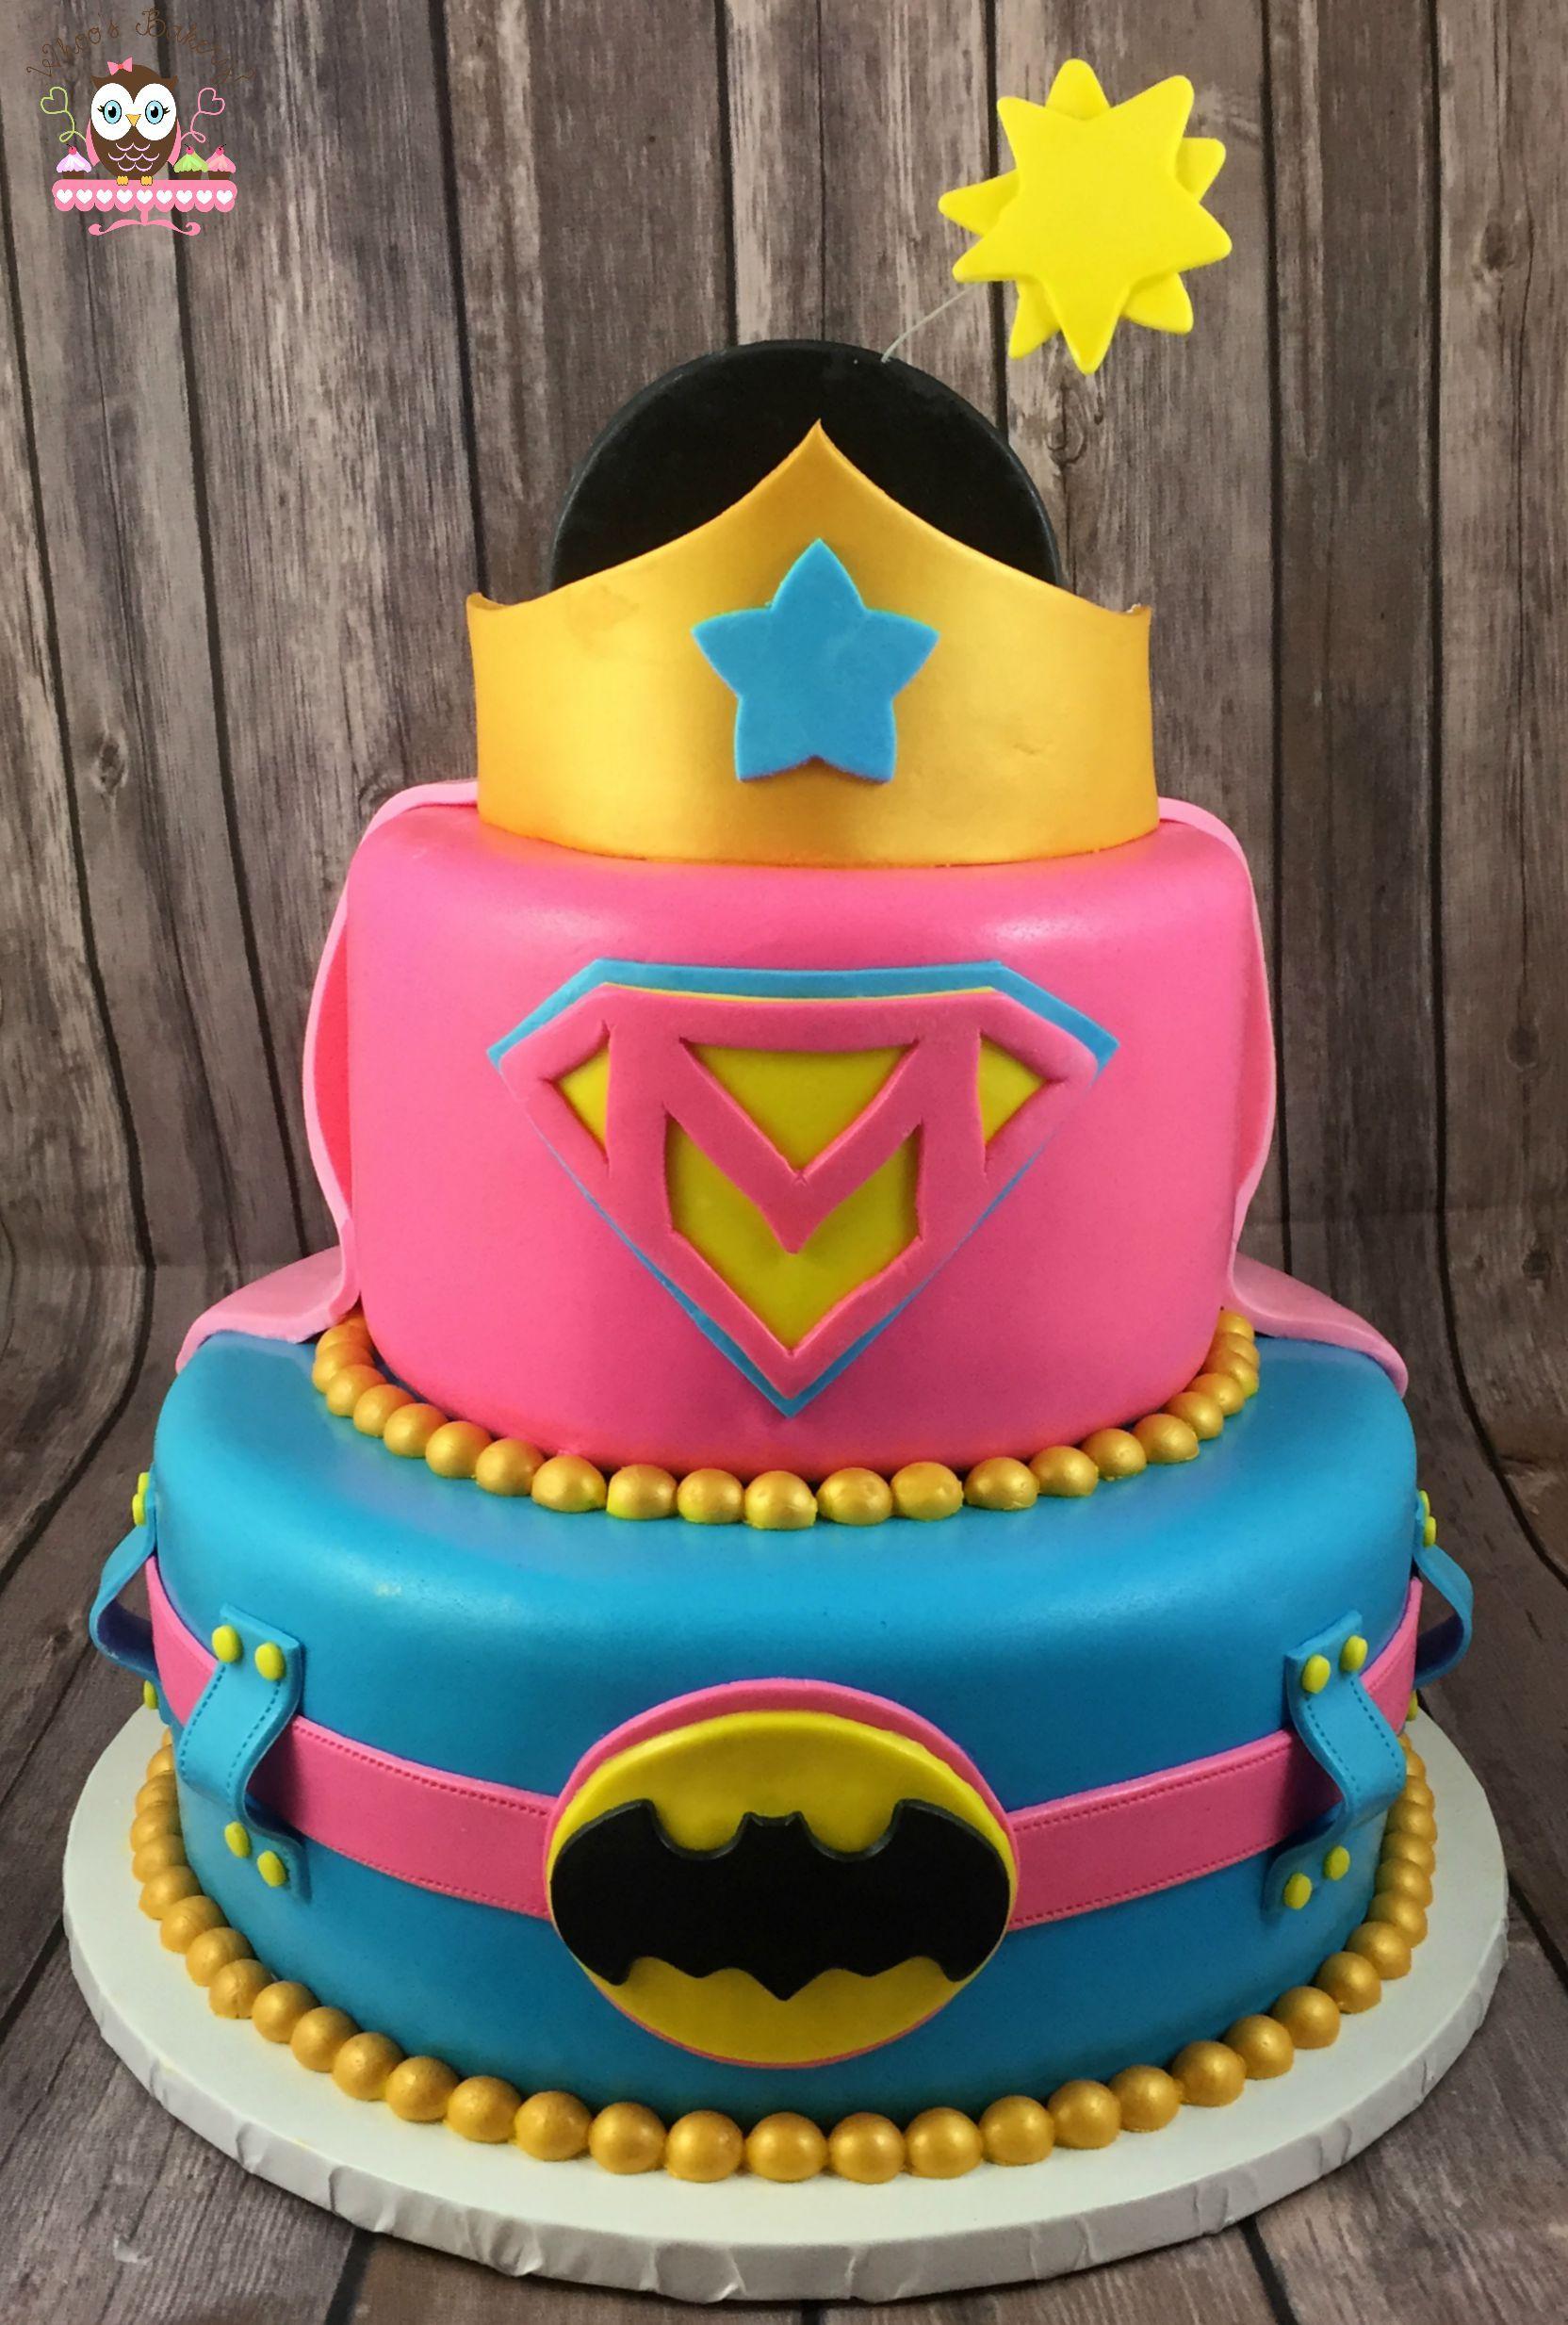 Superhero cake Girl Superhero Cake Pink superhero Batman Cake